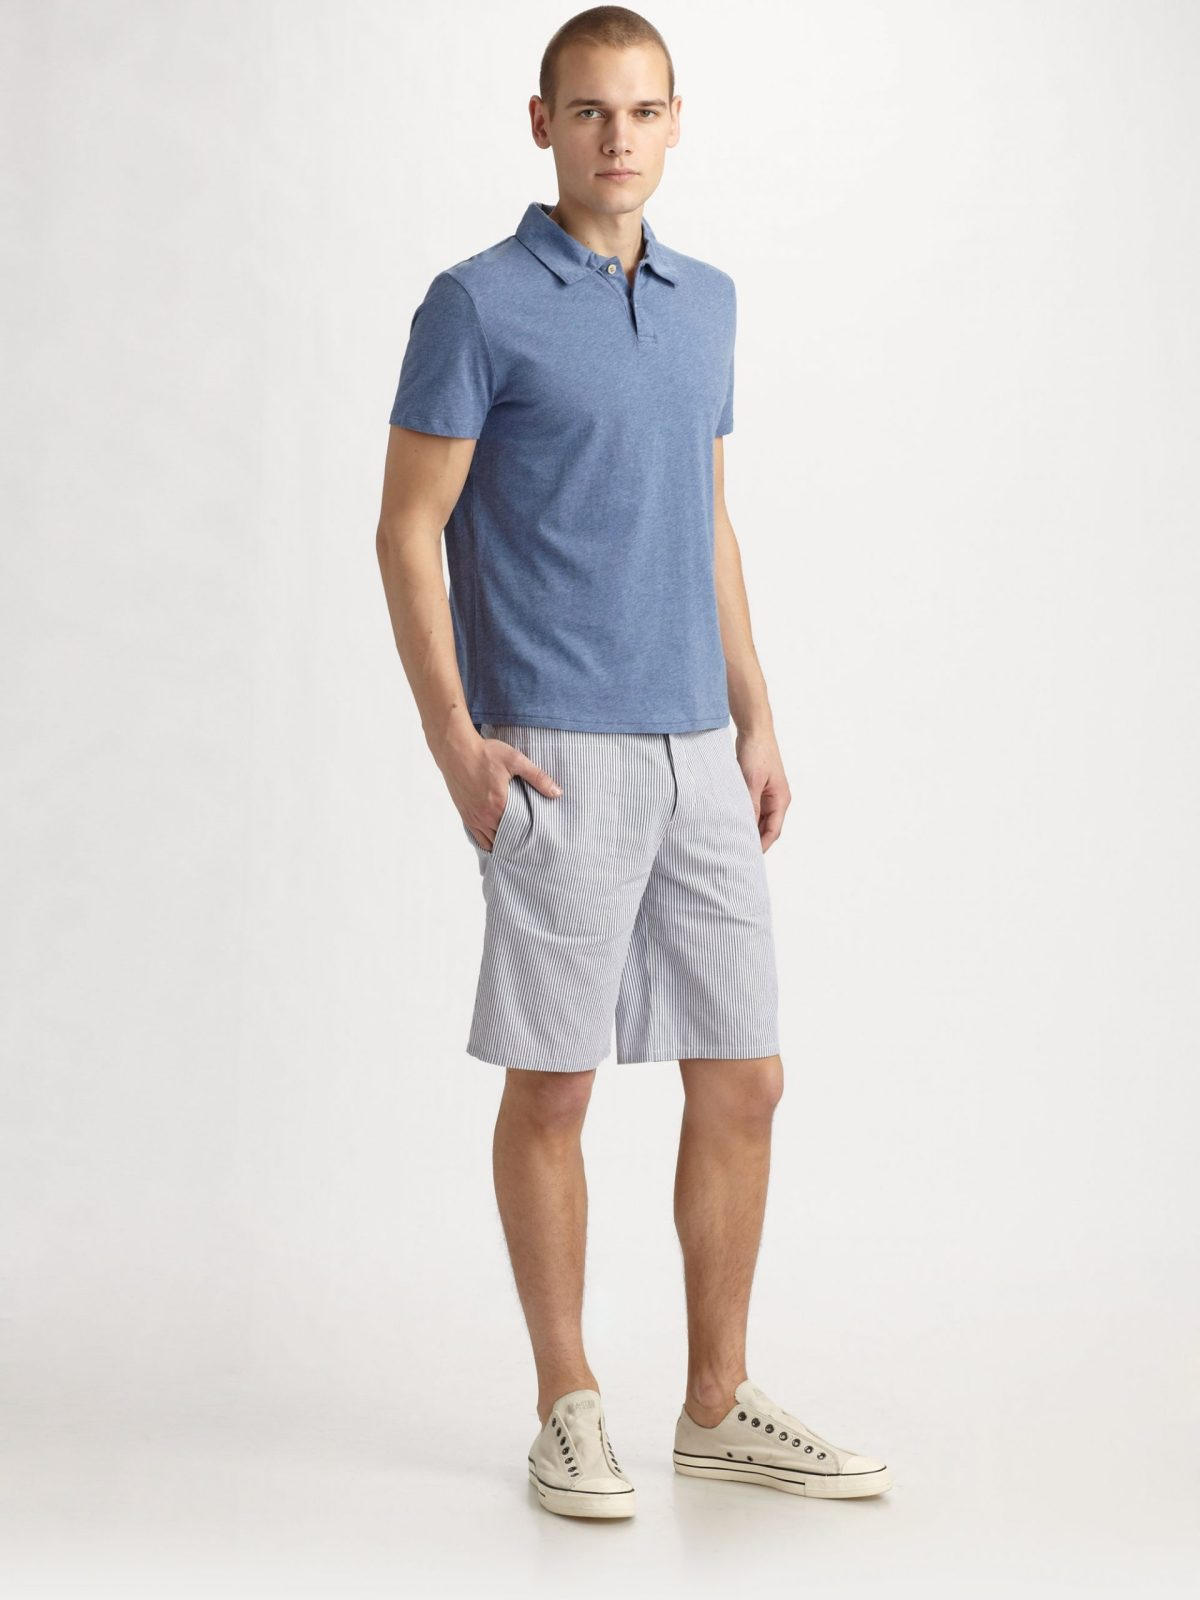 lyst apc seersucker shorts in blue for men